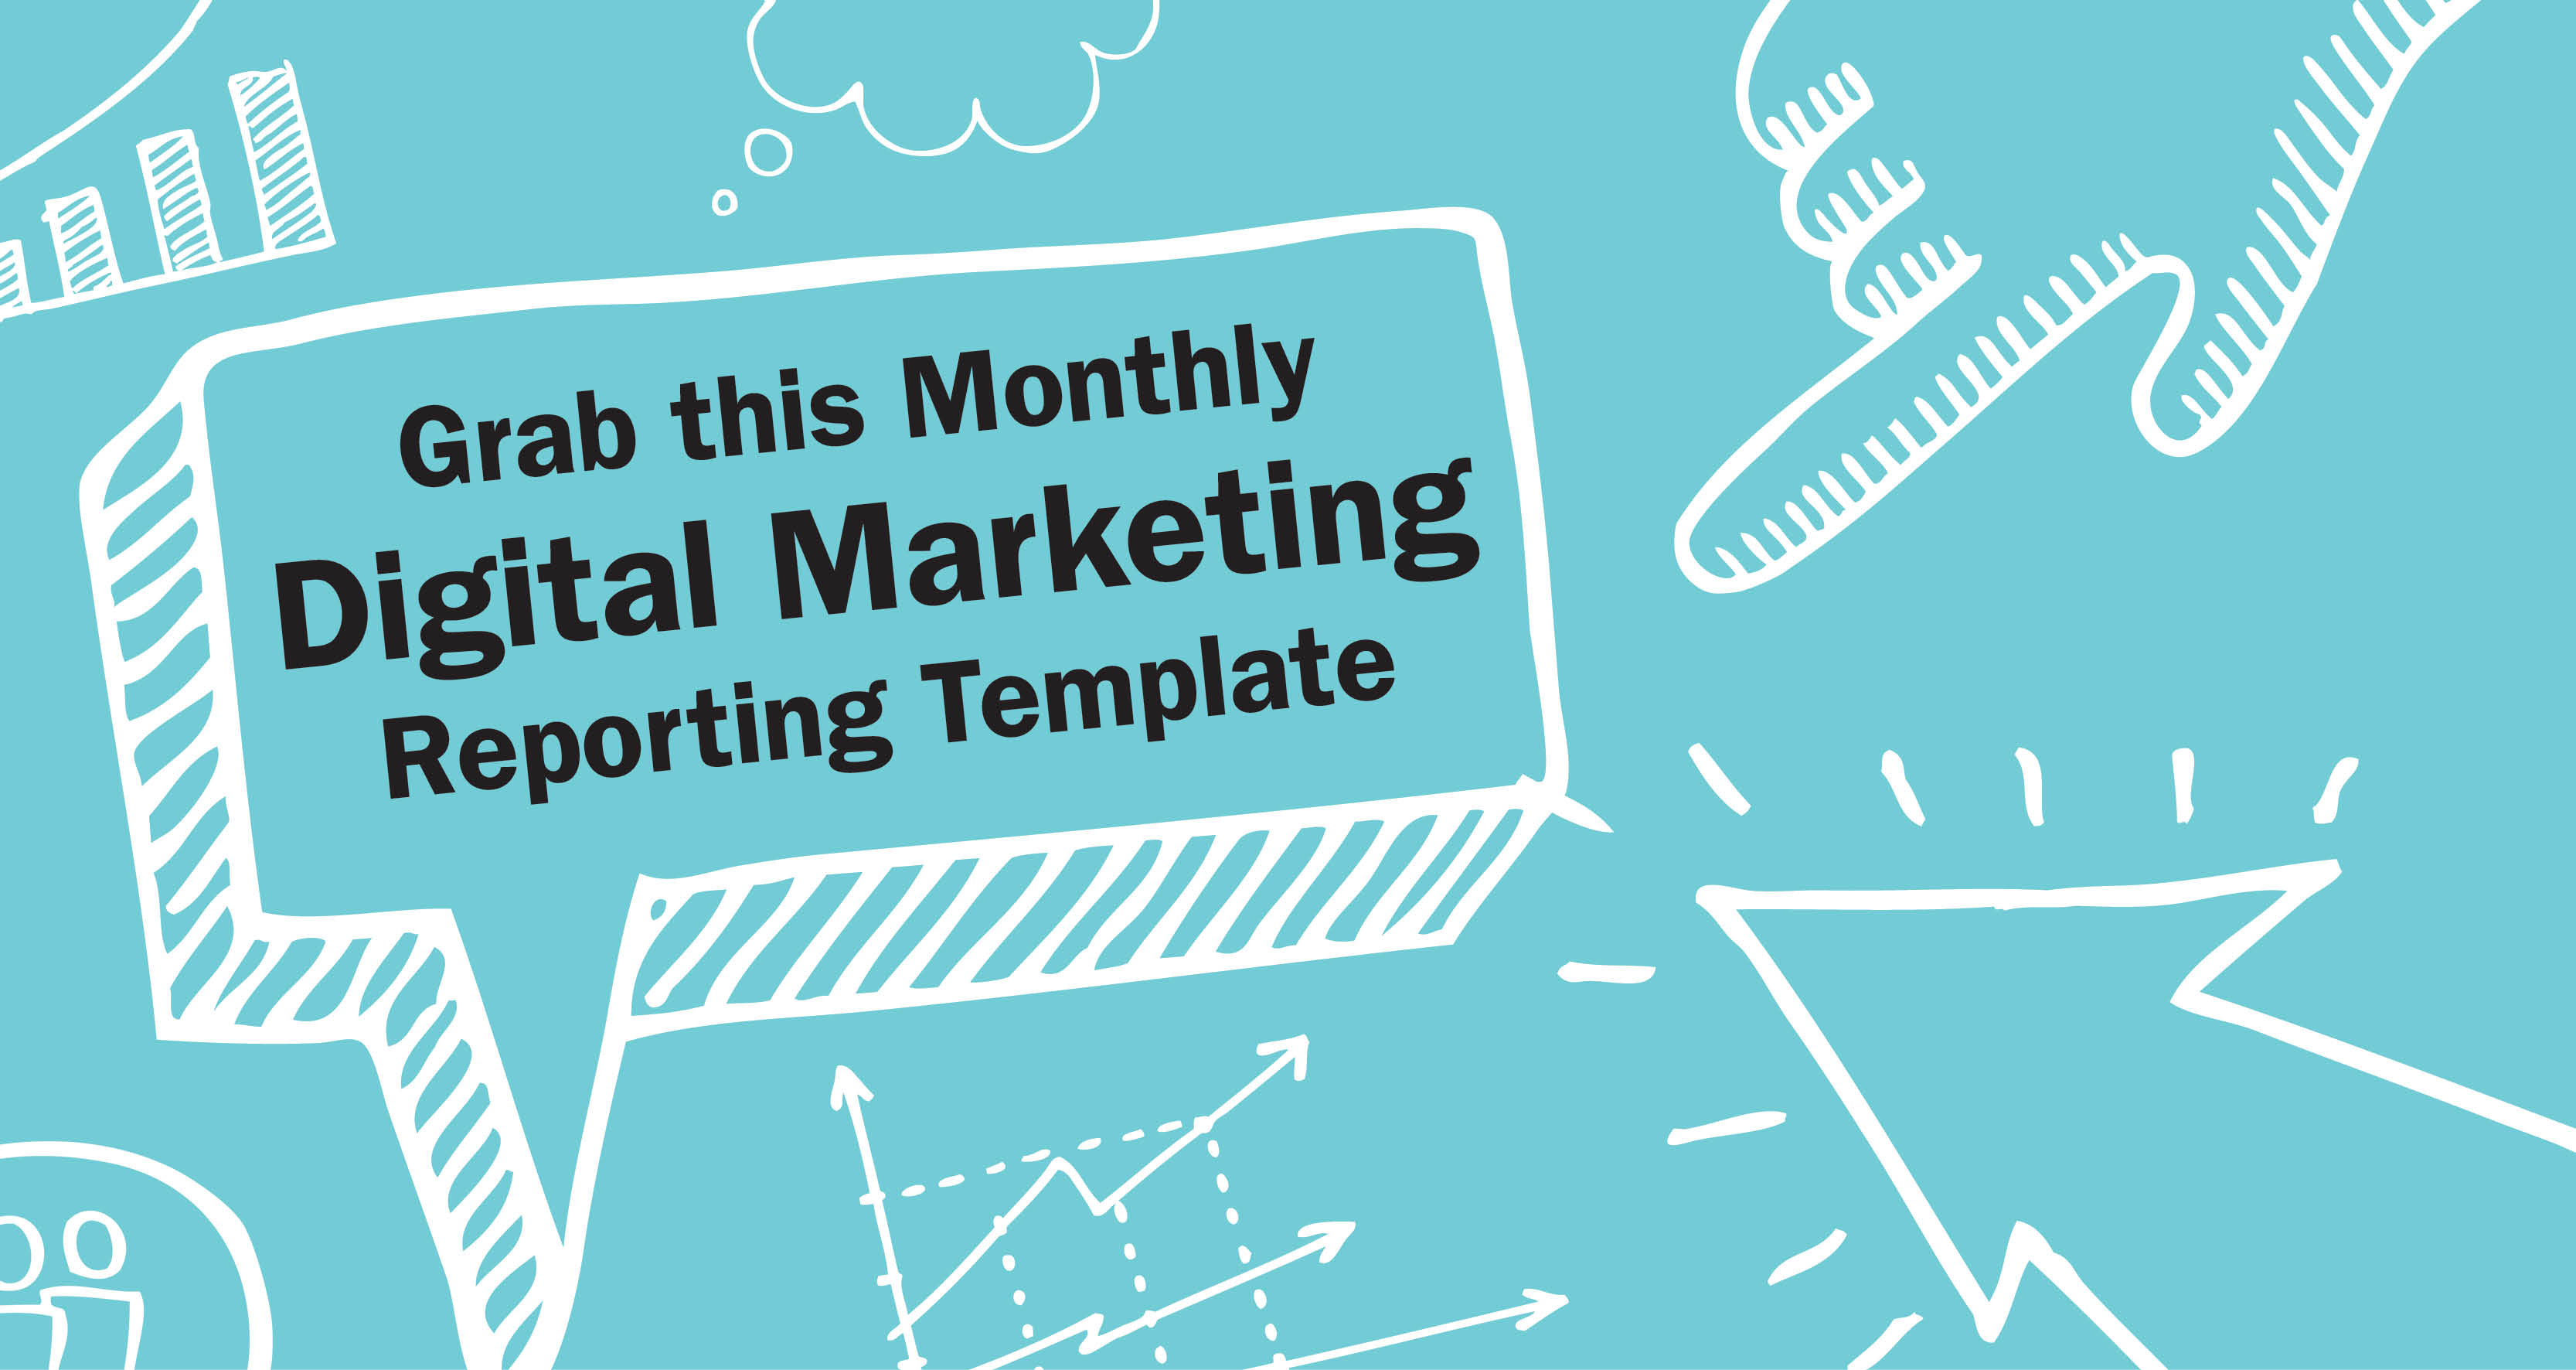 Digital Marketing Report Template Free